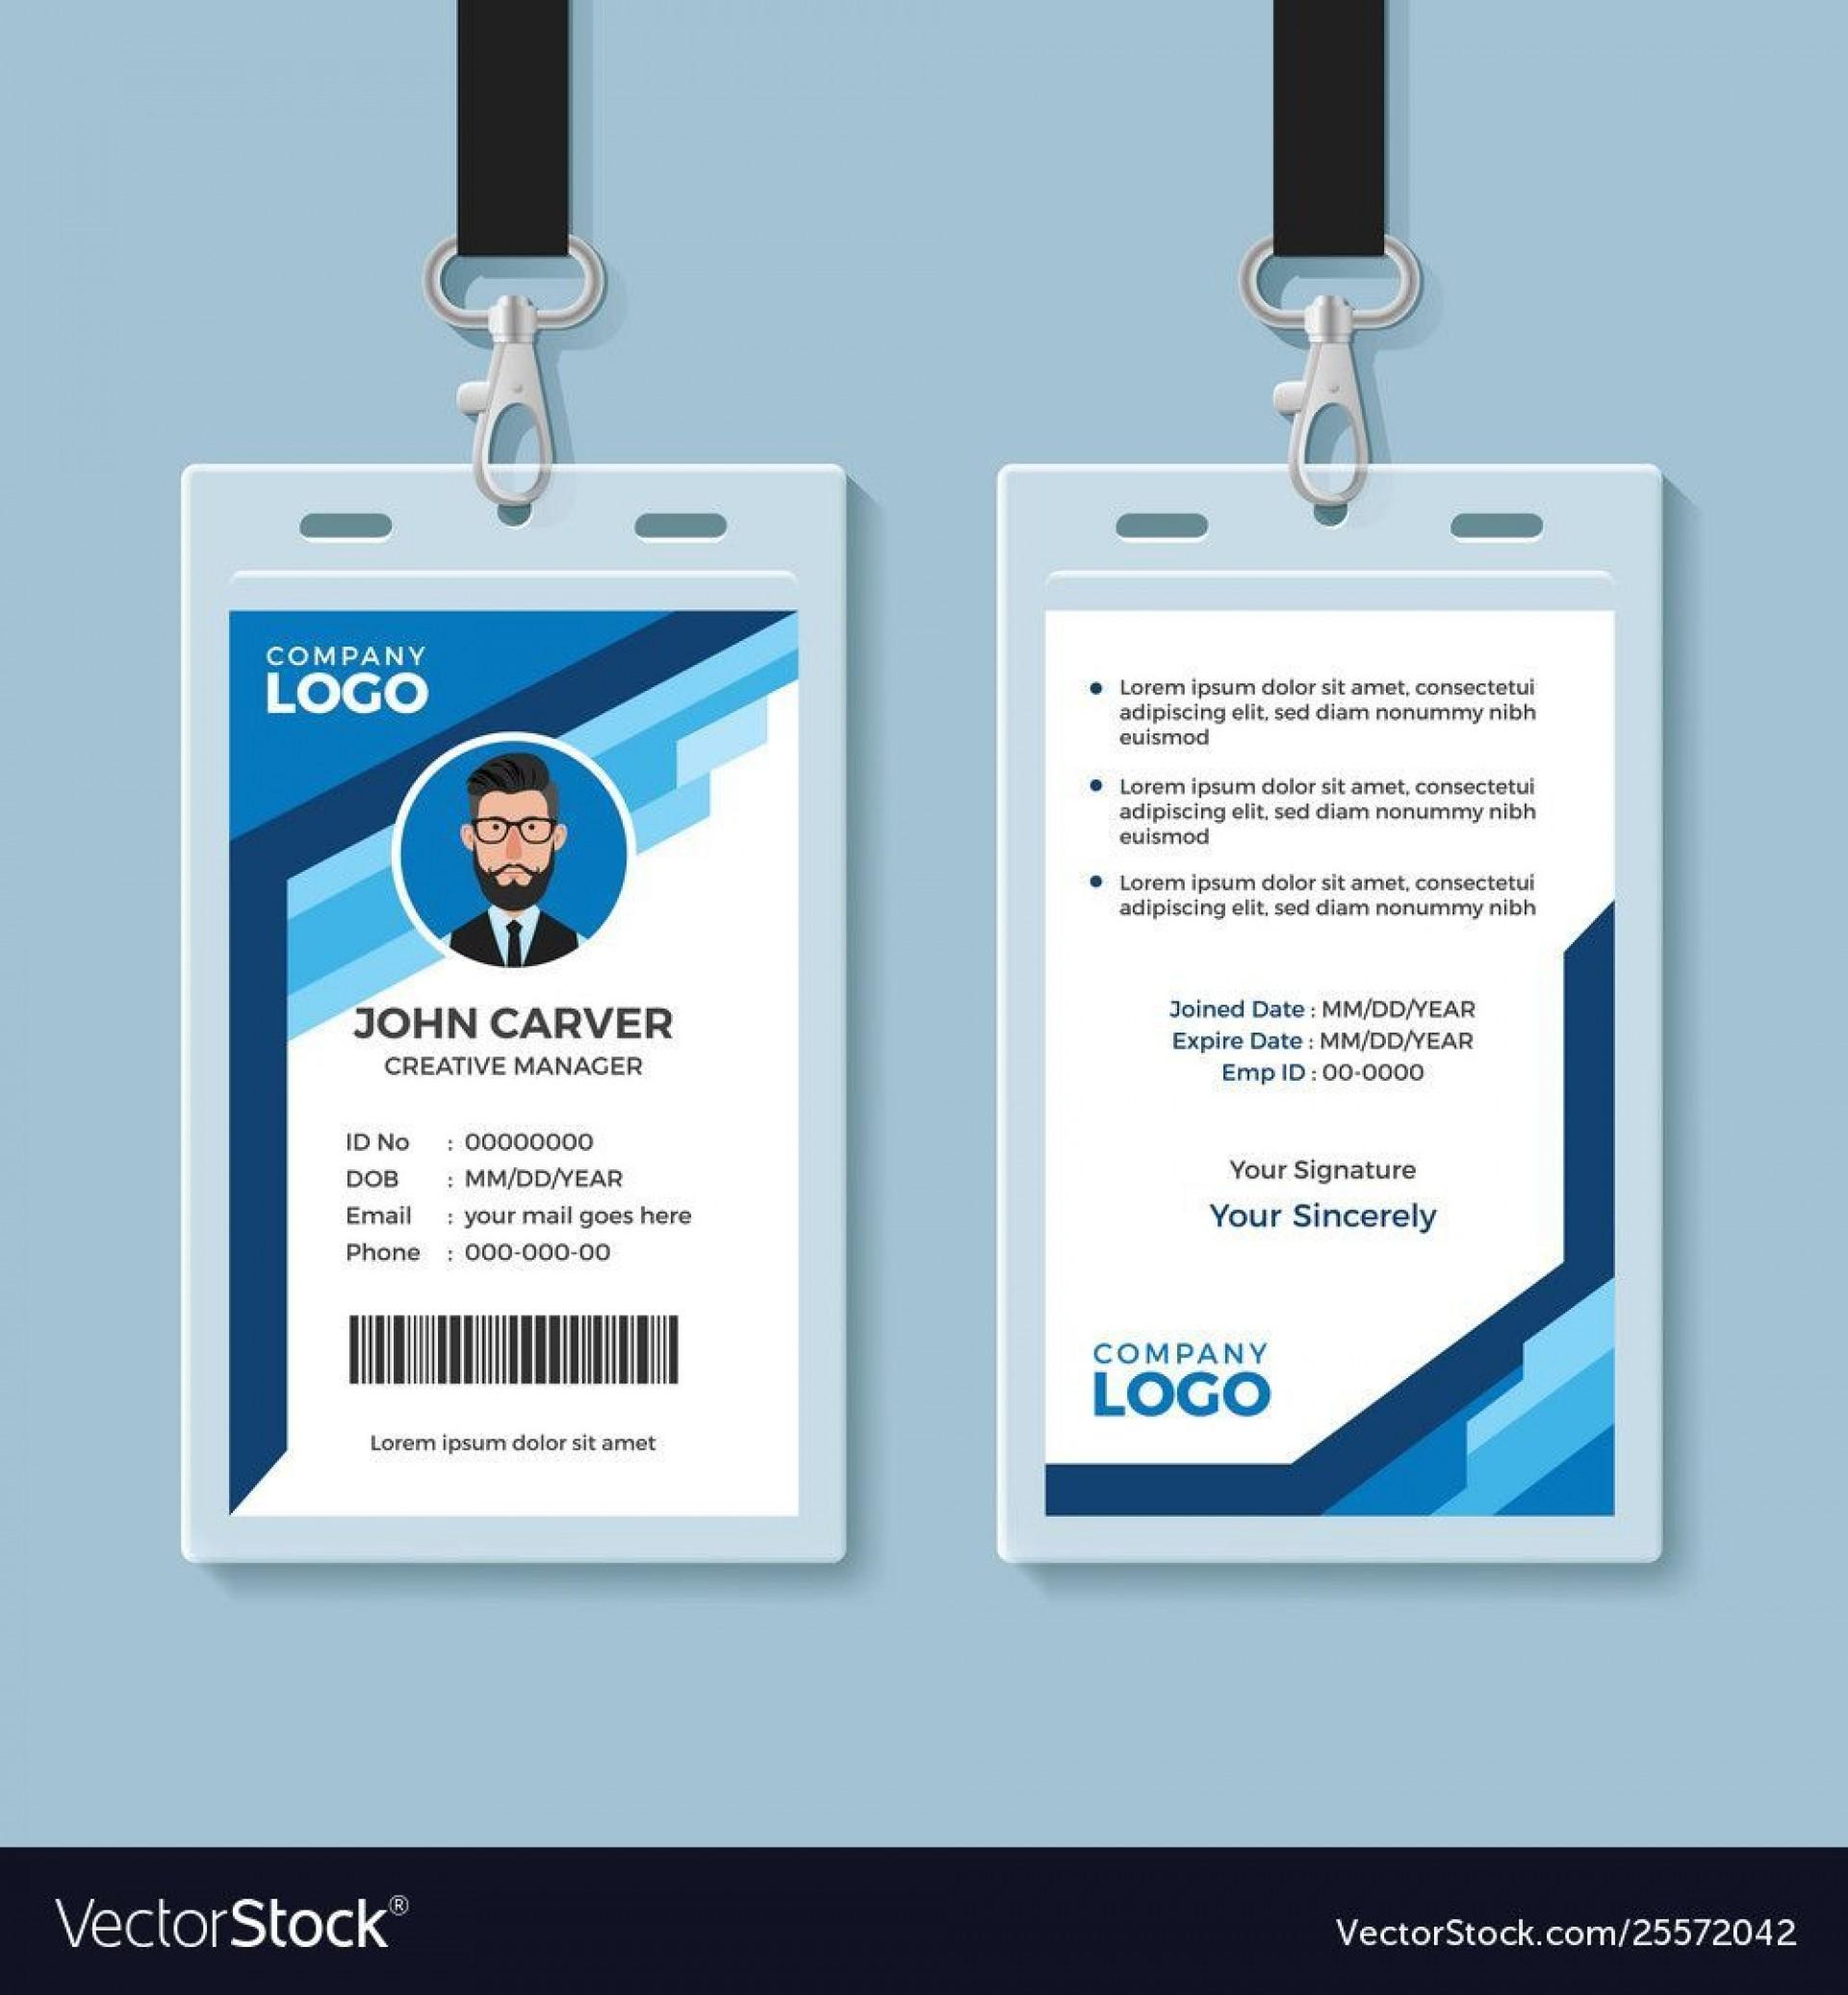 006 Breathtaking Id Badge Template Word Highest Clarity  Free Employee1920